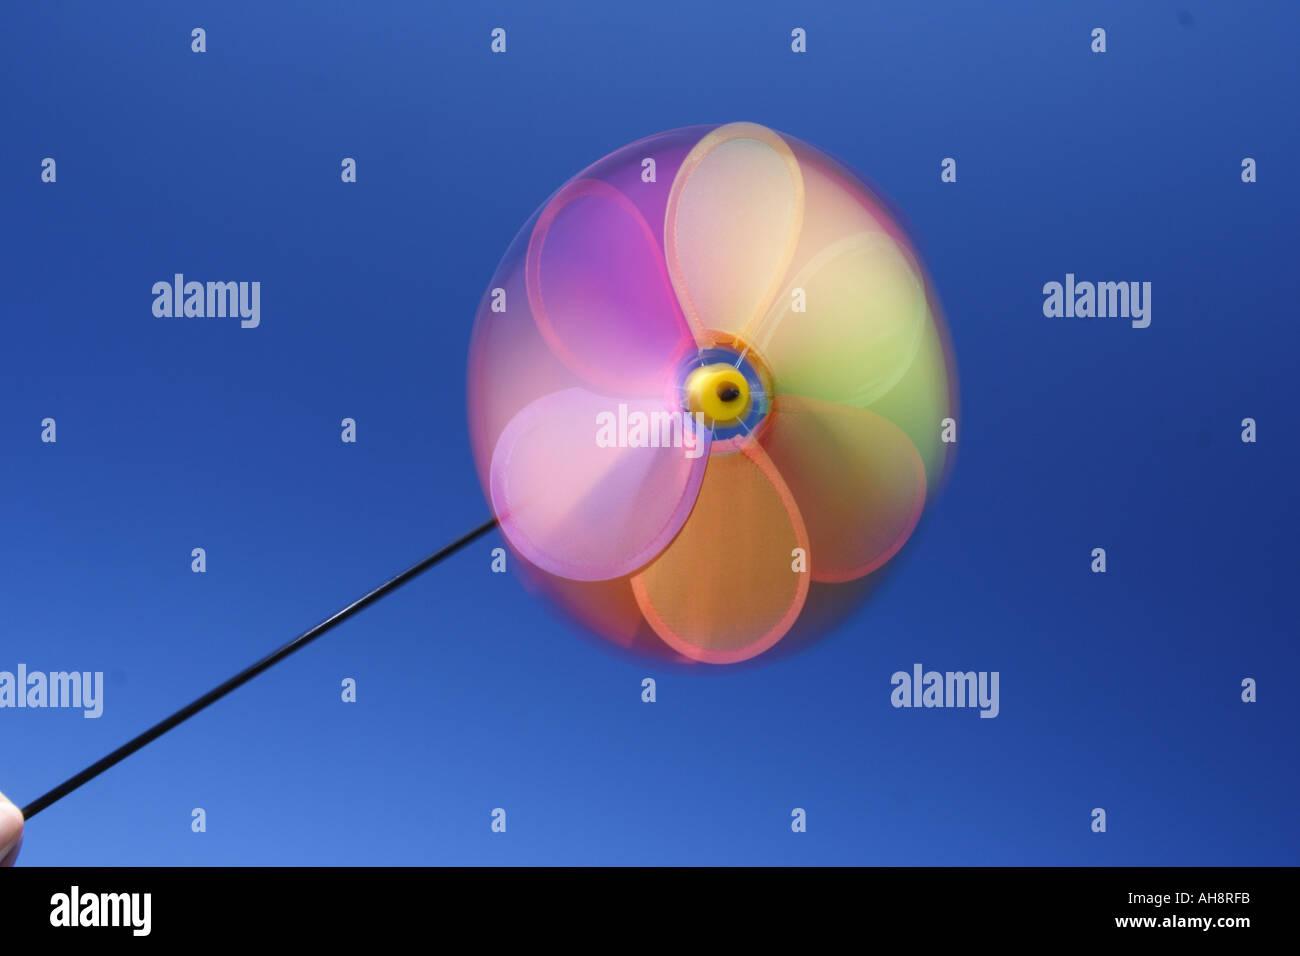 A brightly coloured pinwheel BAPD 2469 - Stock Image